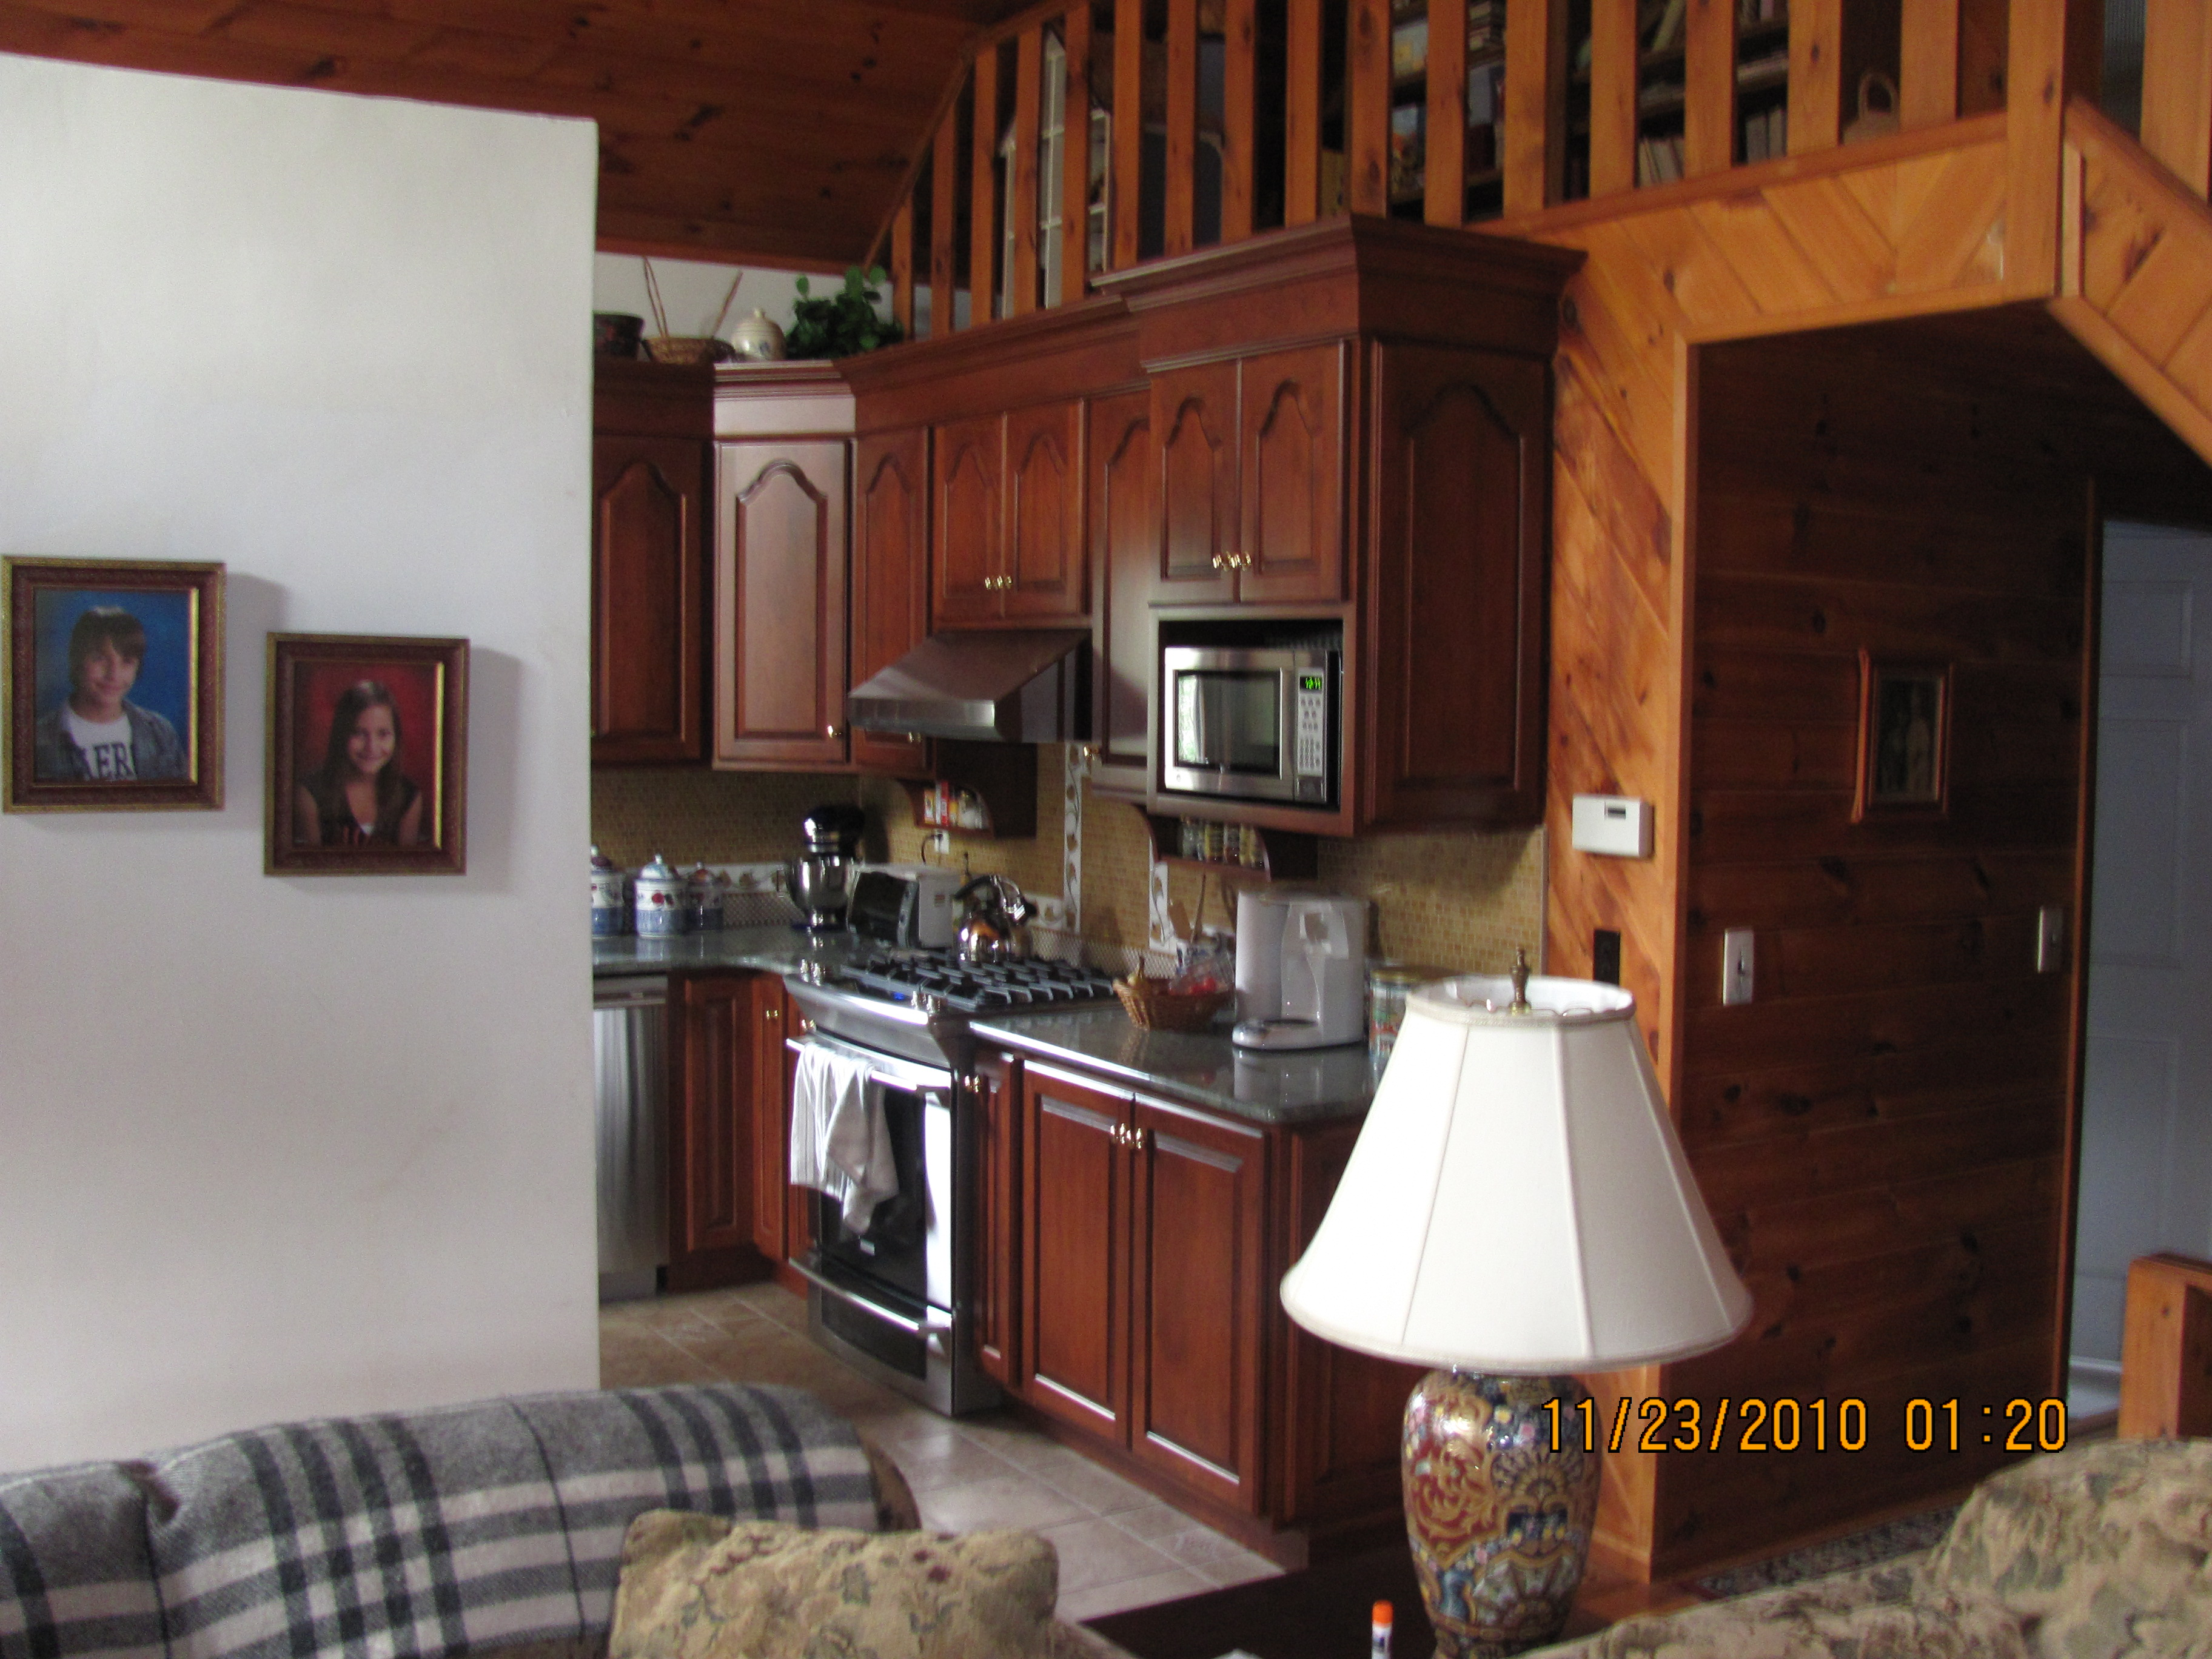 Kitchen Remodeling, Custom Cabinets & More: Binghamton, NY ...